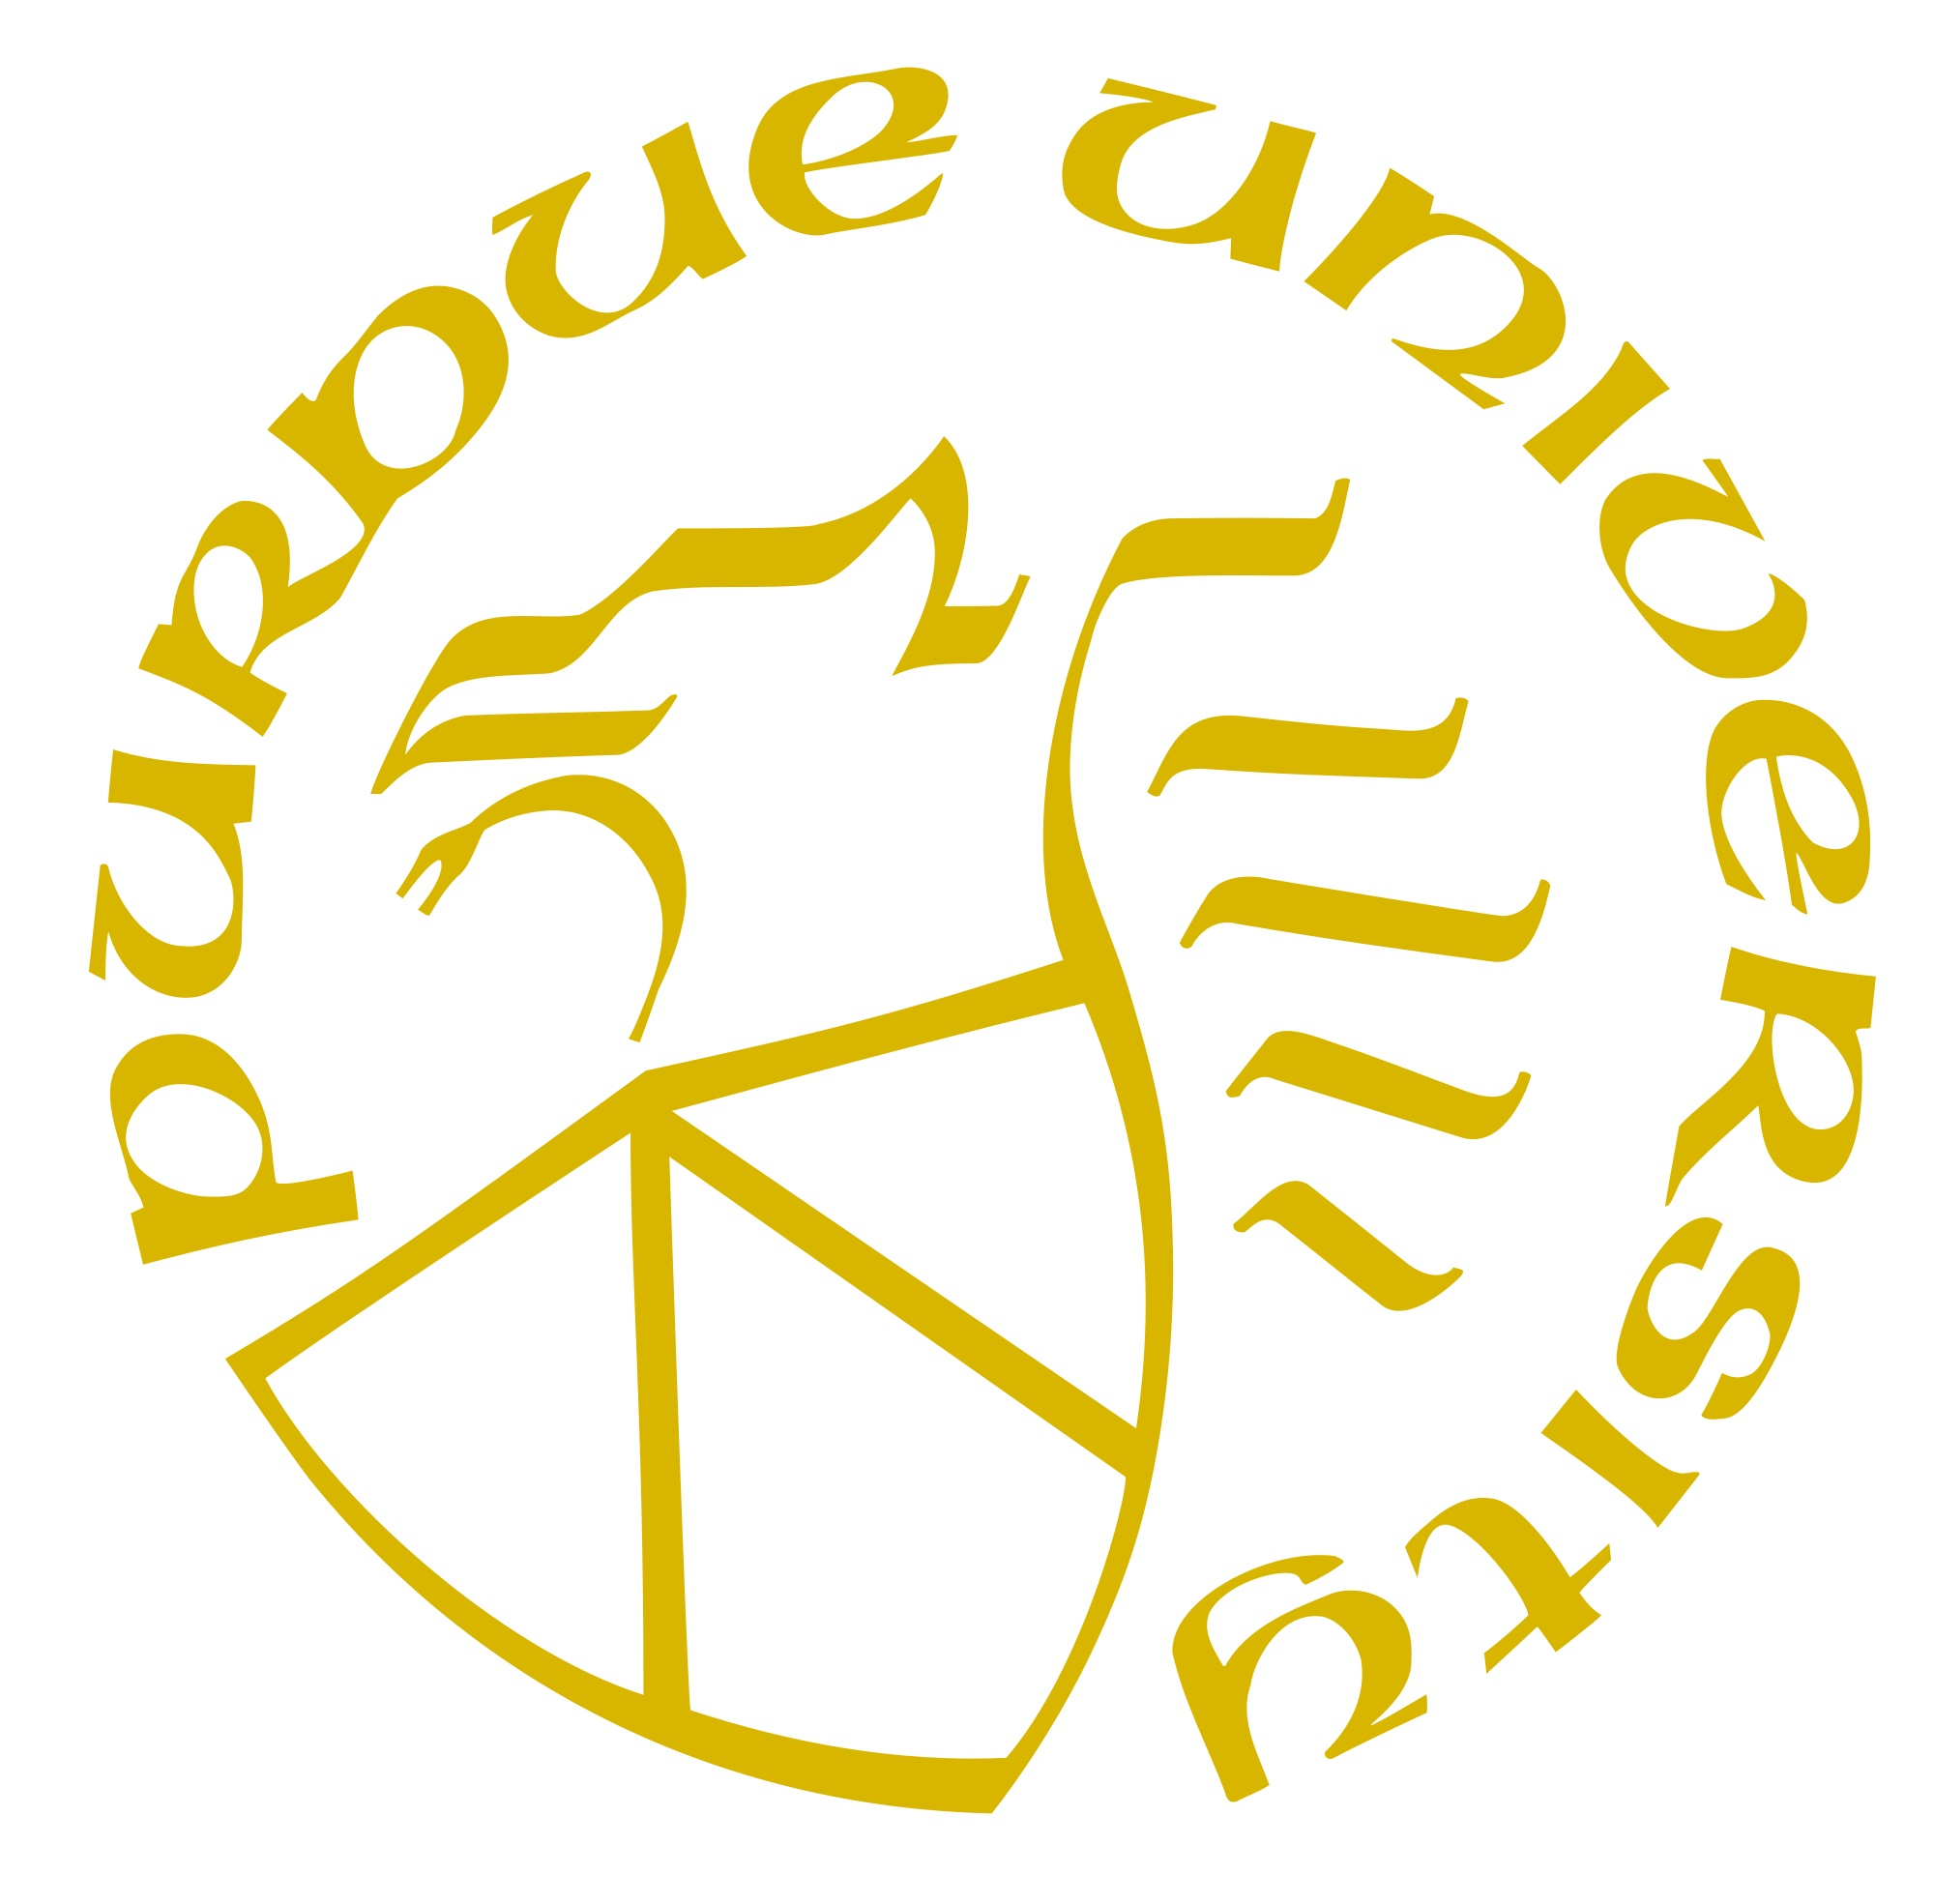 2000px-Purdue_University_Seal.jpg